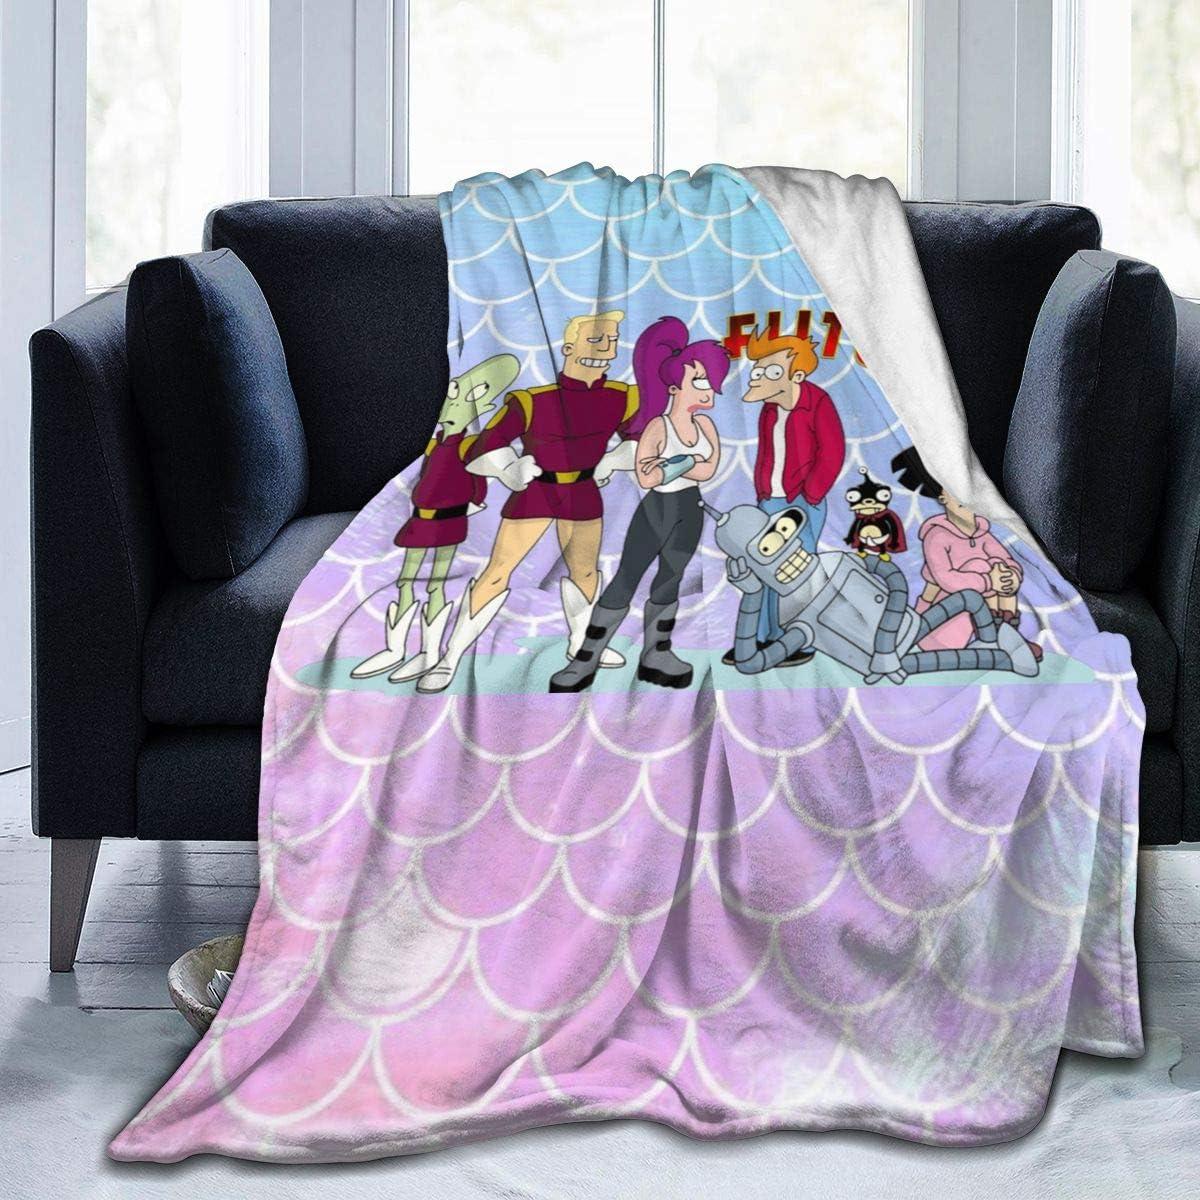 Amazon Com Hguftu5du Futurama Bender Living Room Bedroom Leisure Blanket Super Soft Air Conditioning Quilt Home Kitchen